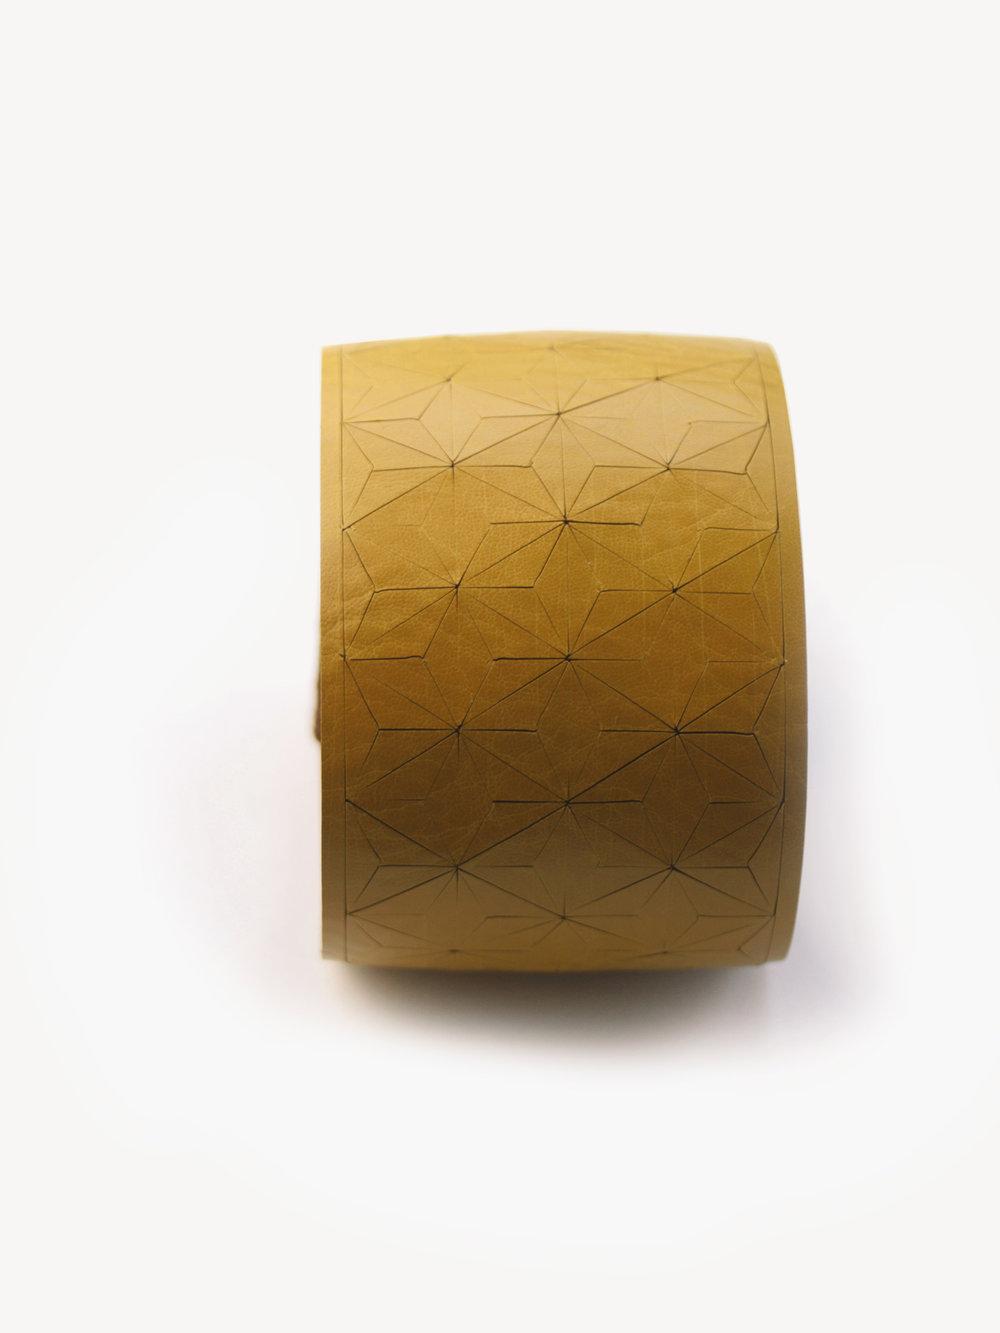 Leder-Armband, breit in senfgelb/ Leather bracelet, small in curry